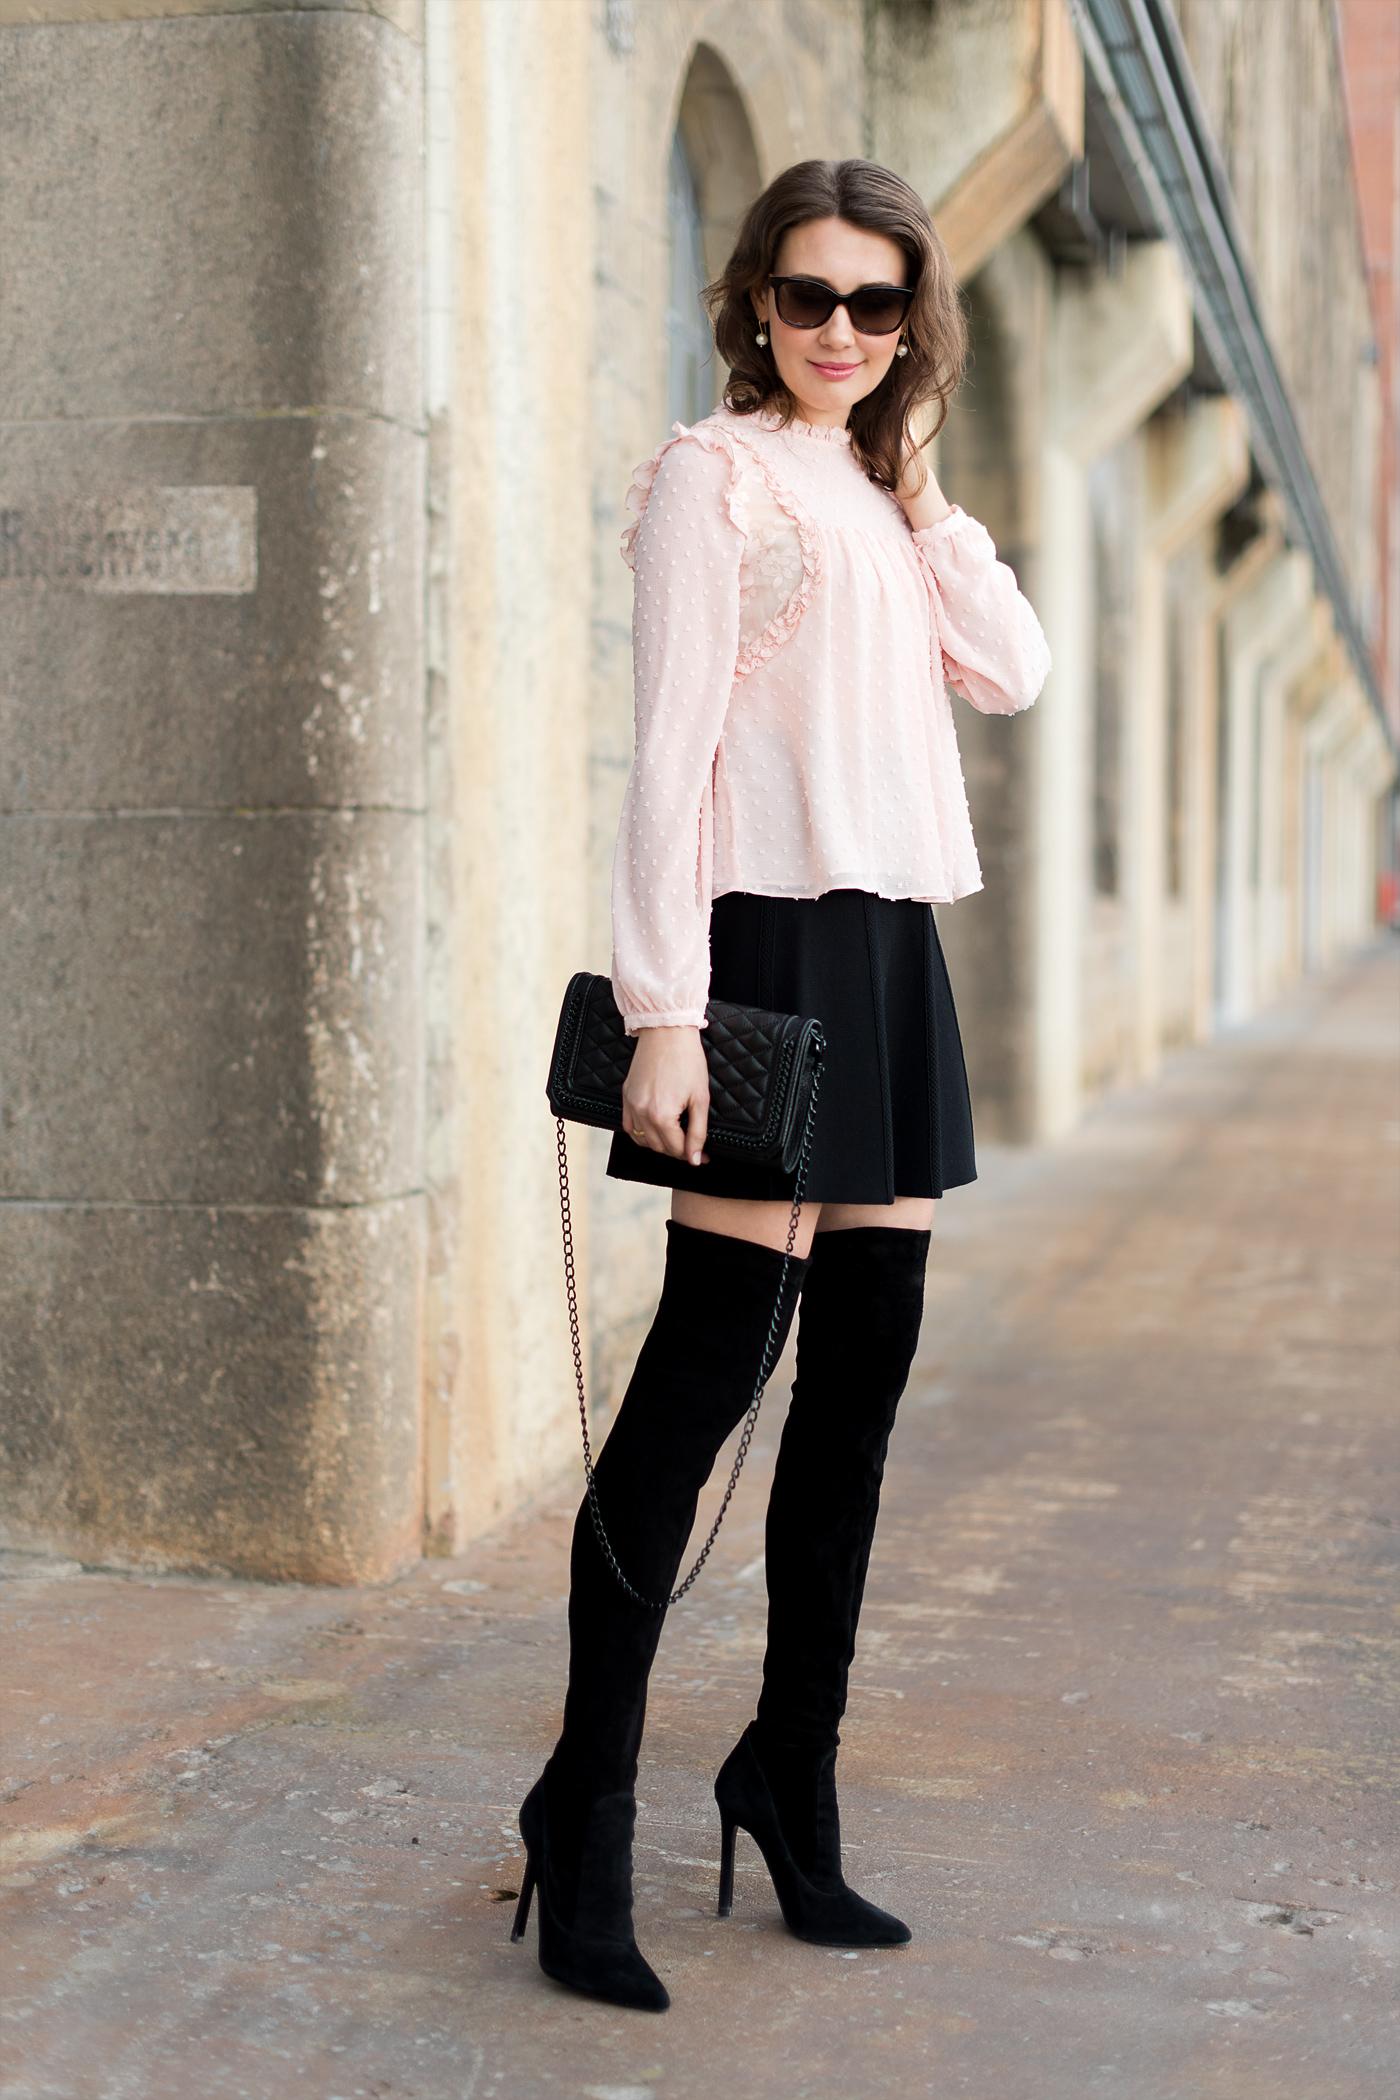 Zara Over Th Knee Boots Blouse Rebecca Minkoff Love Mini